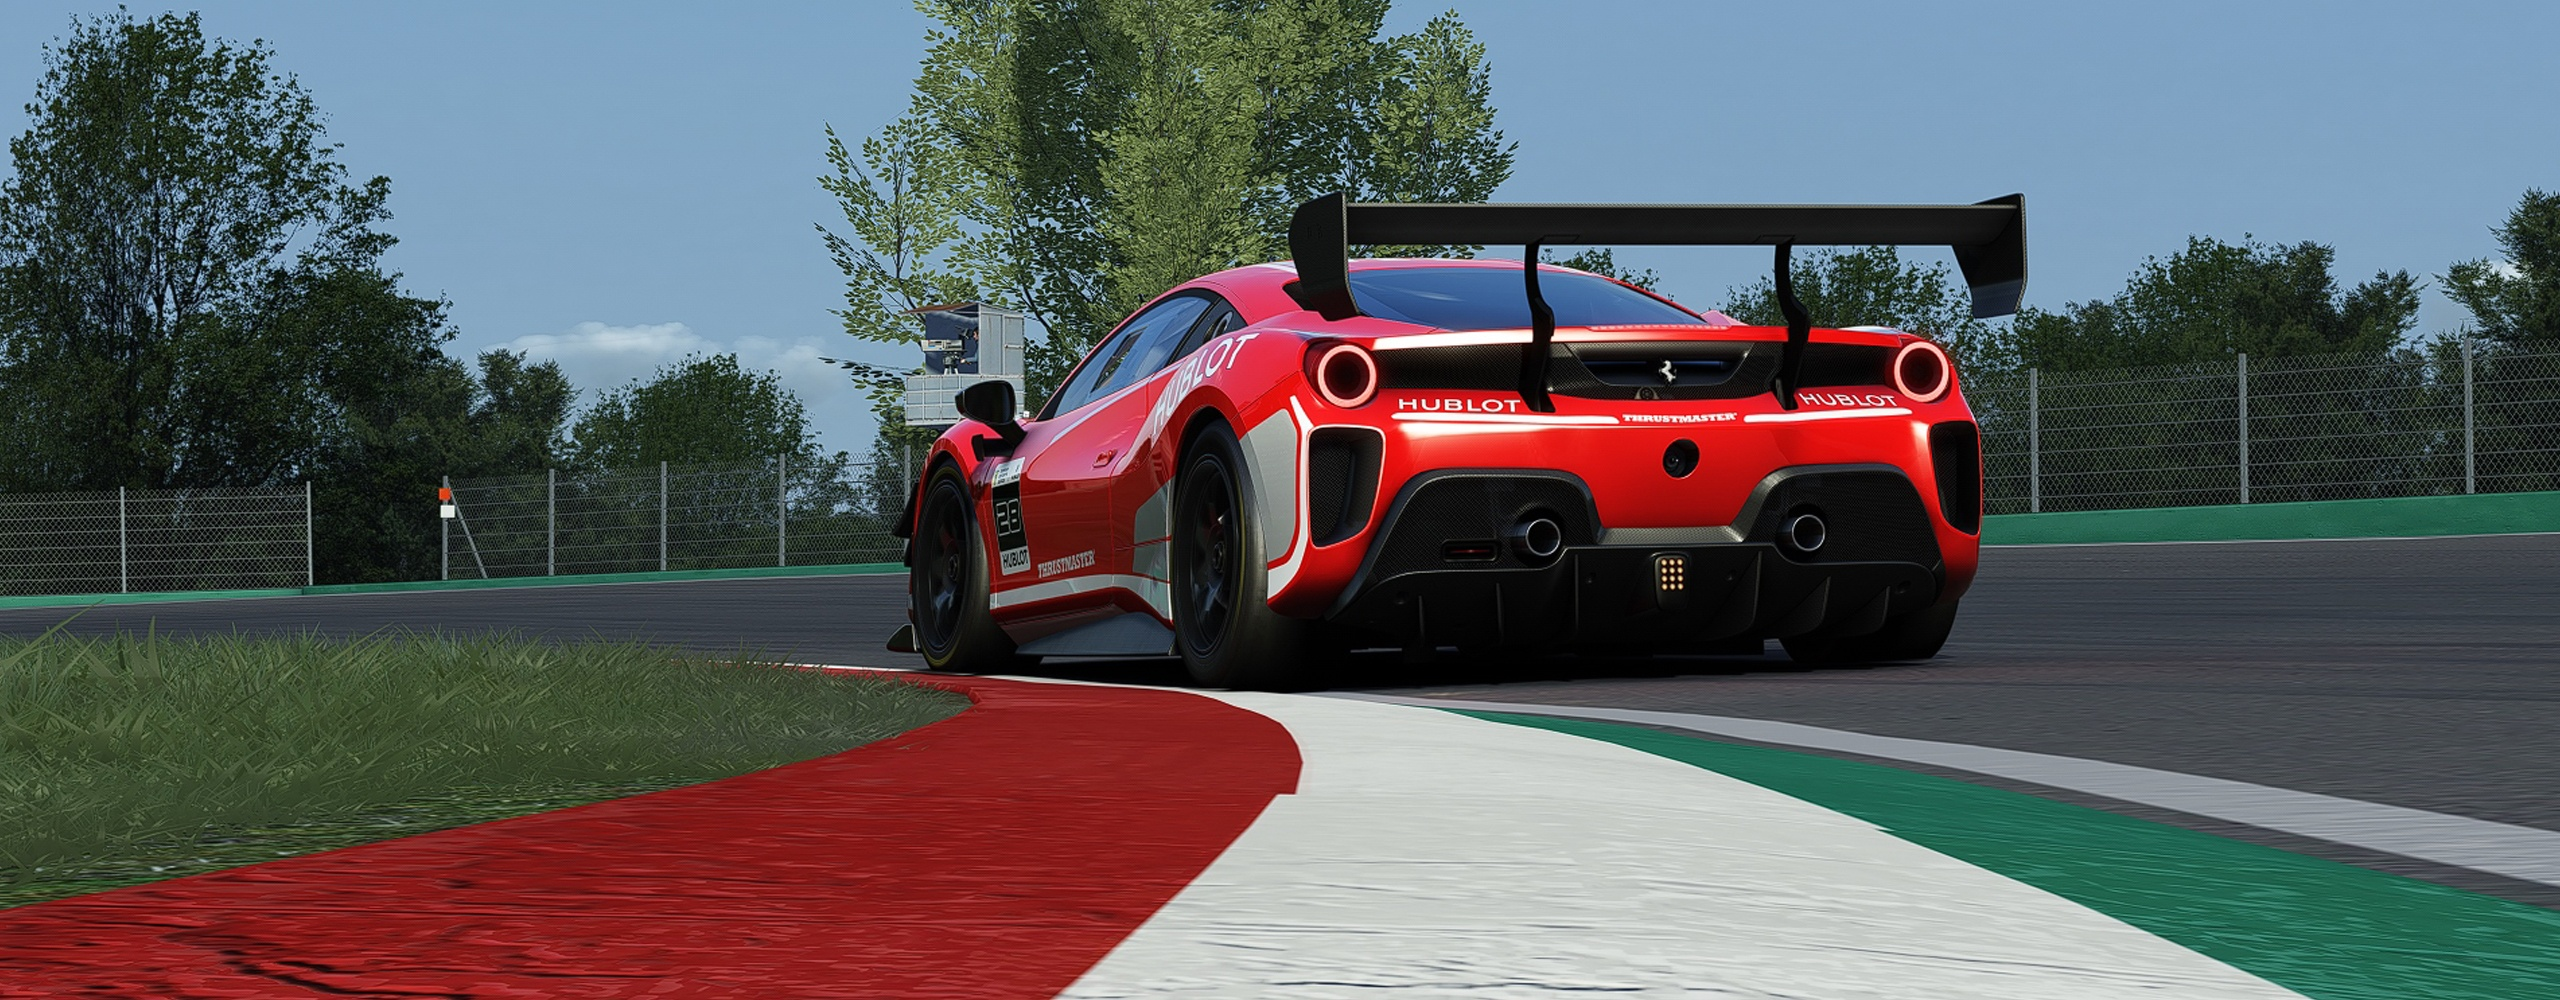 Ferrari Hublot Esports Series To Use Assetto Corsa